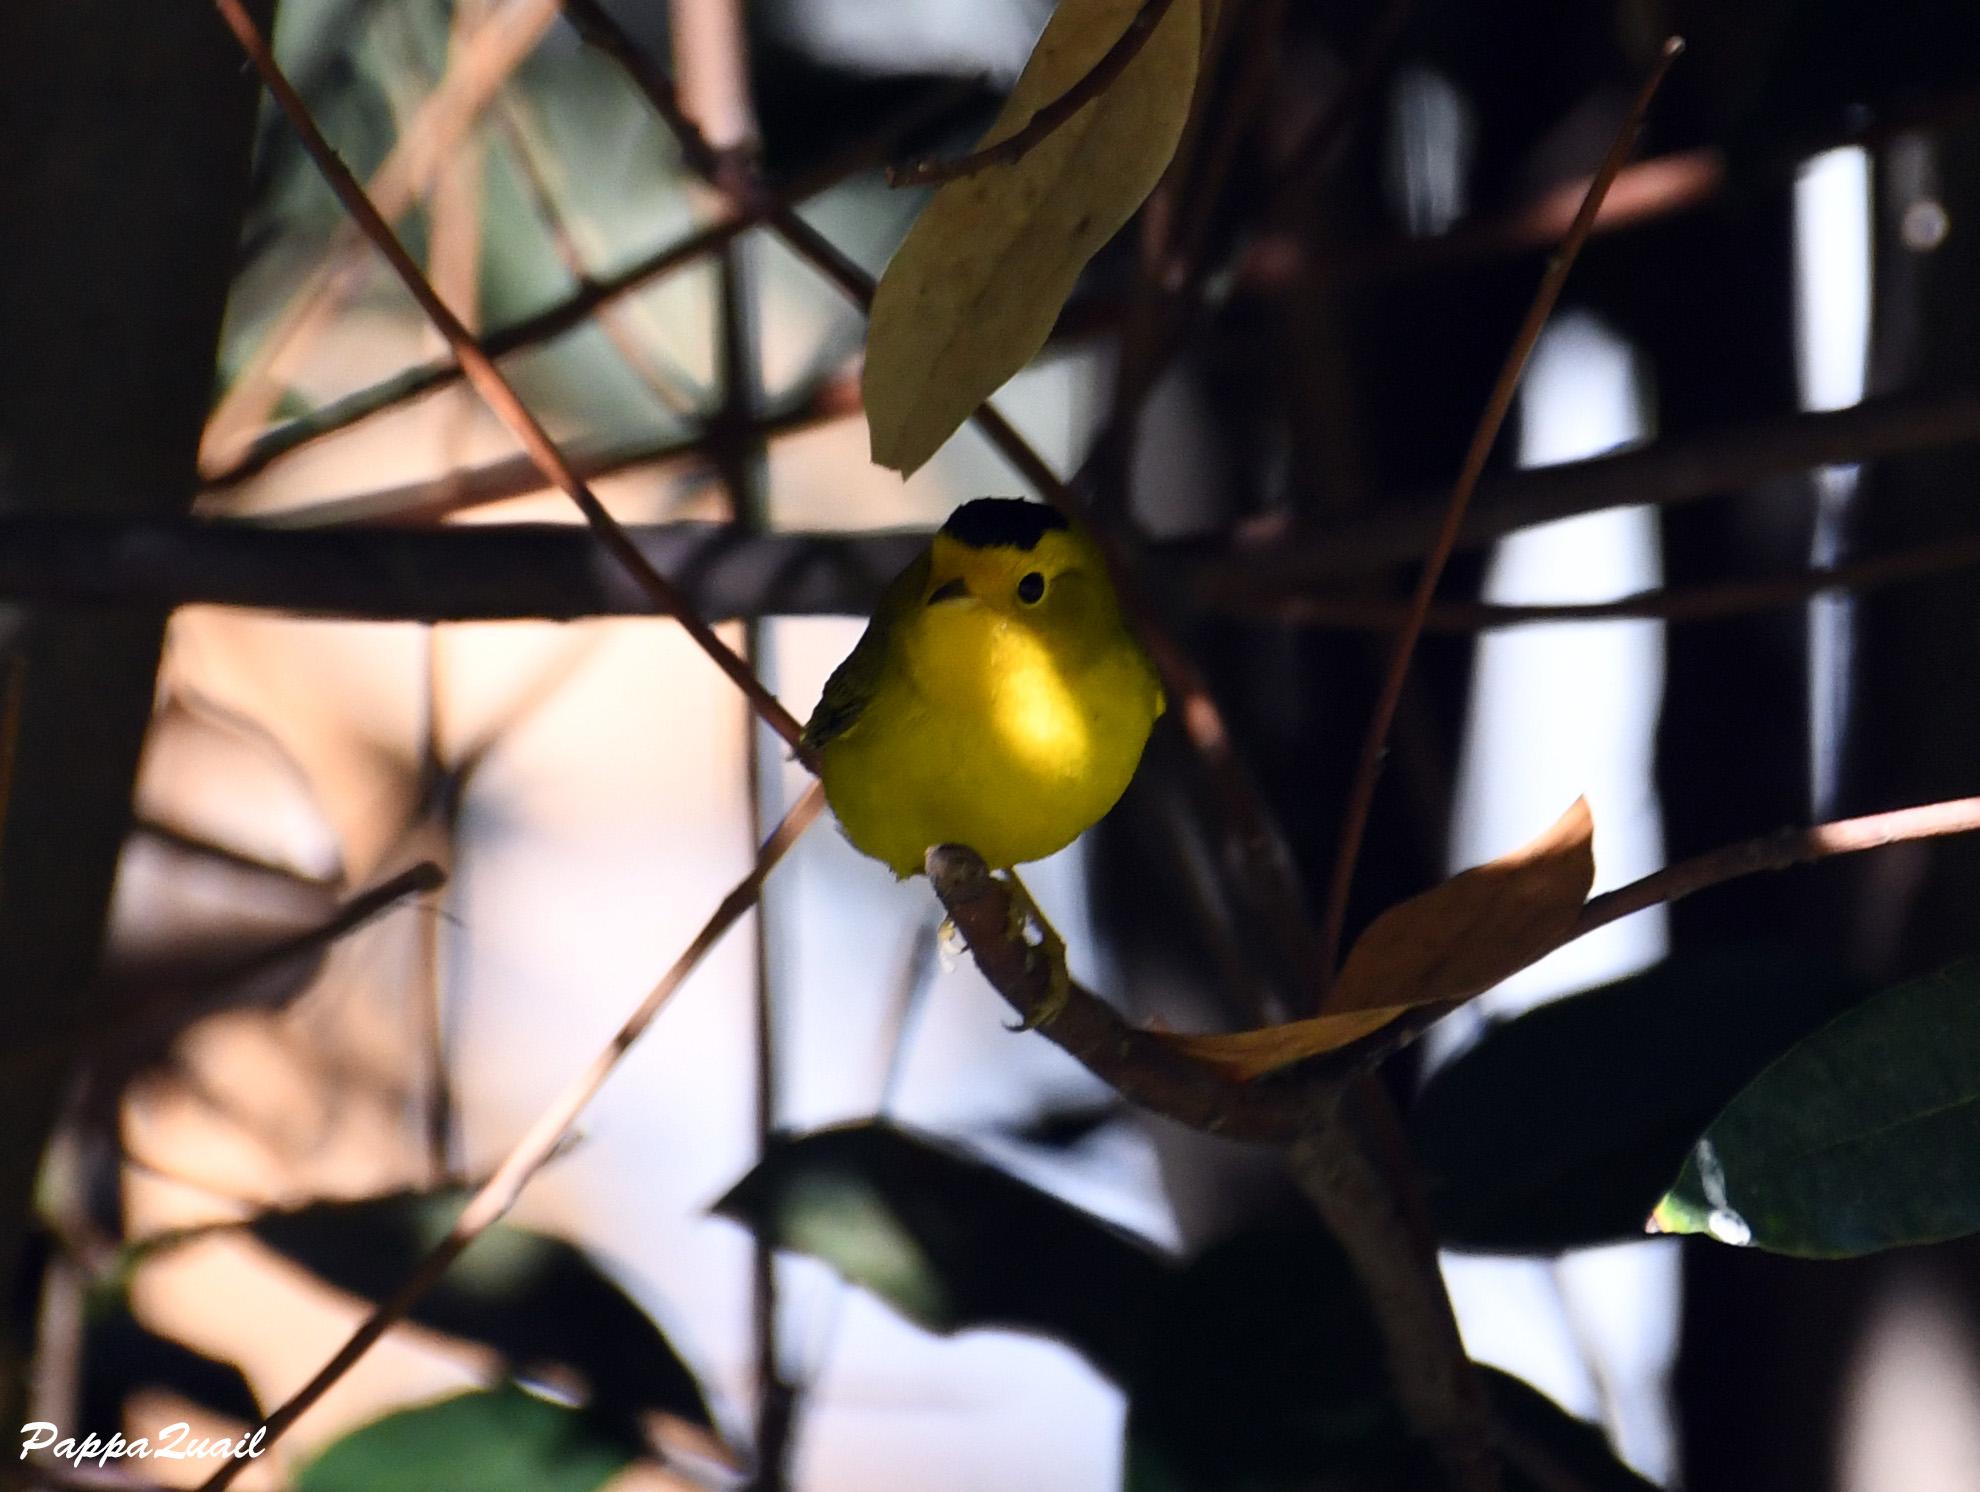 Wilson's Warbler - adult male